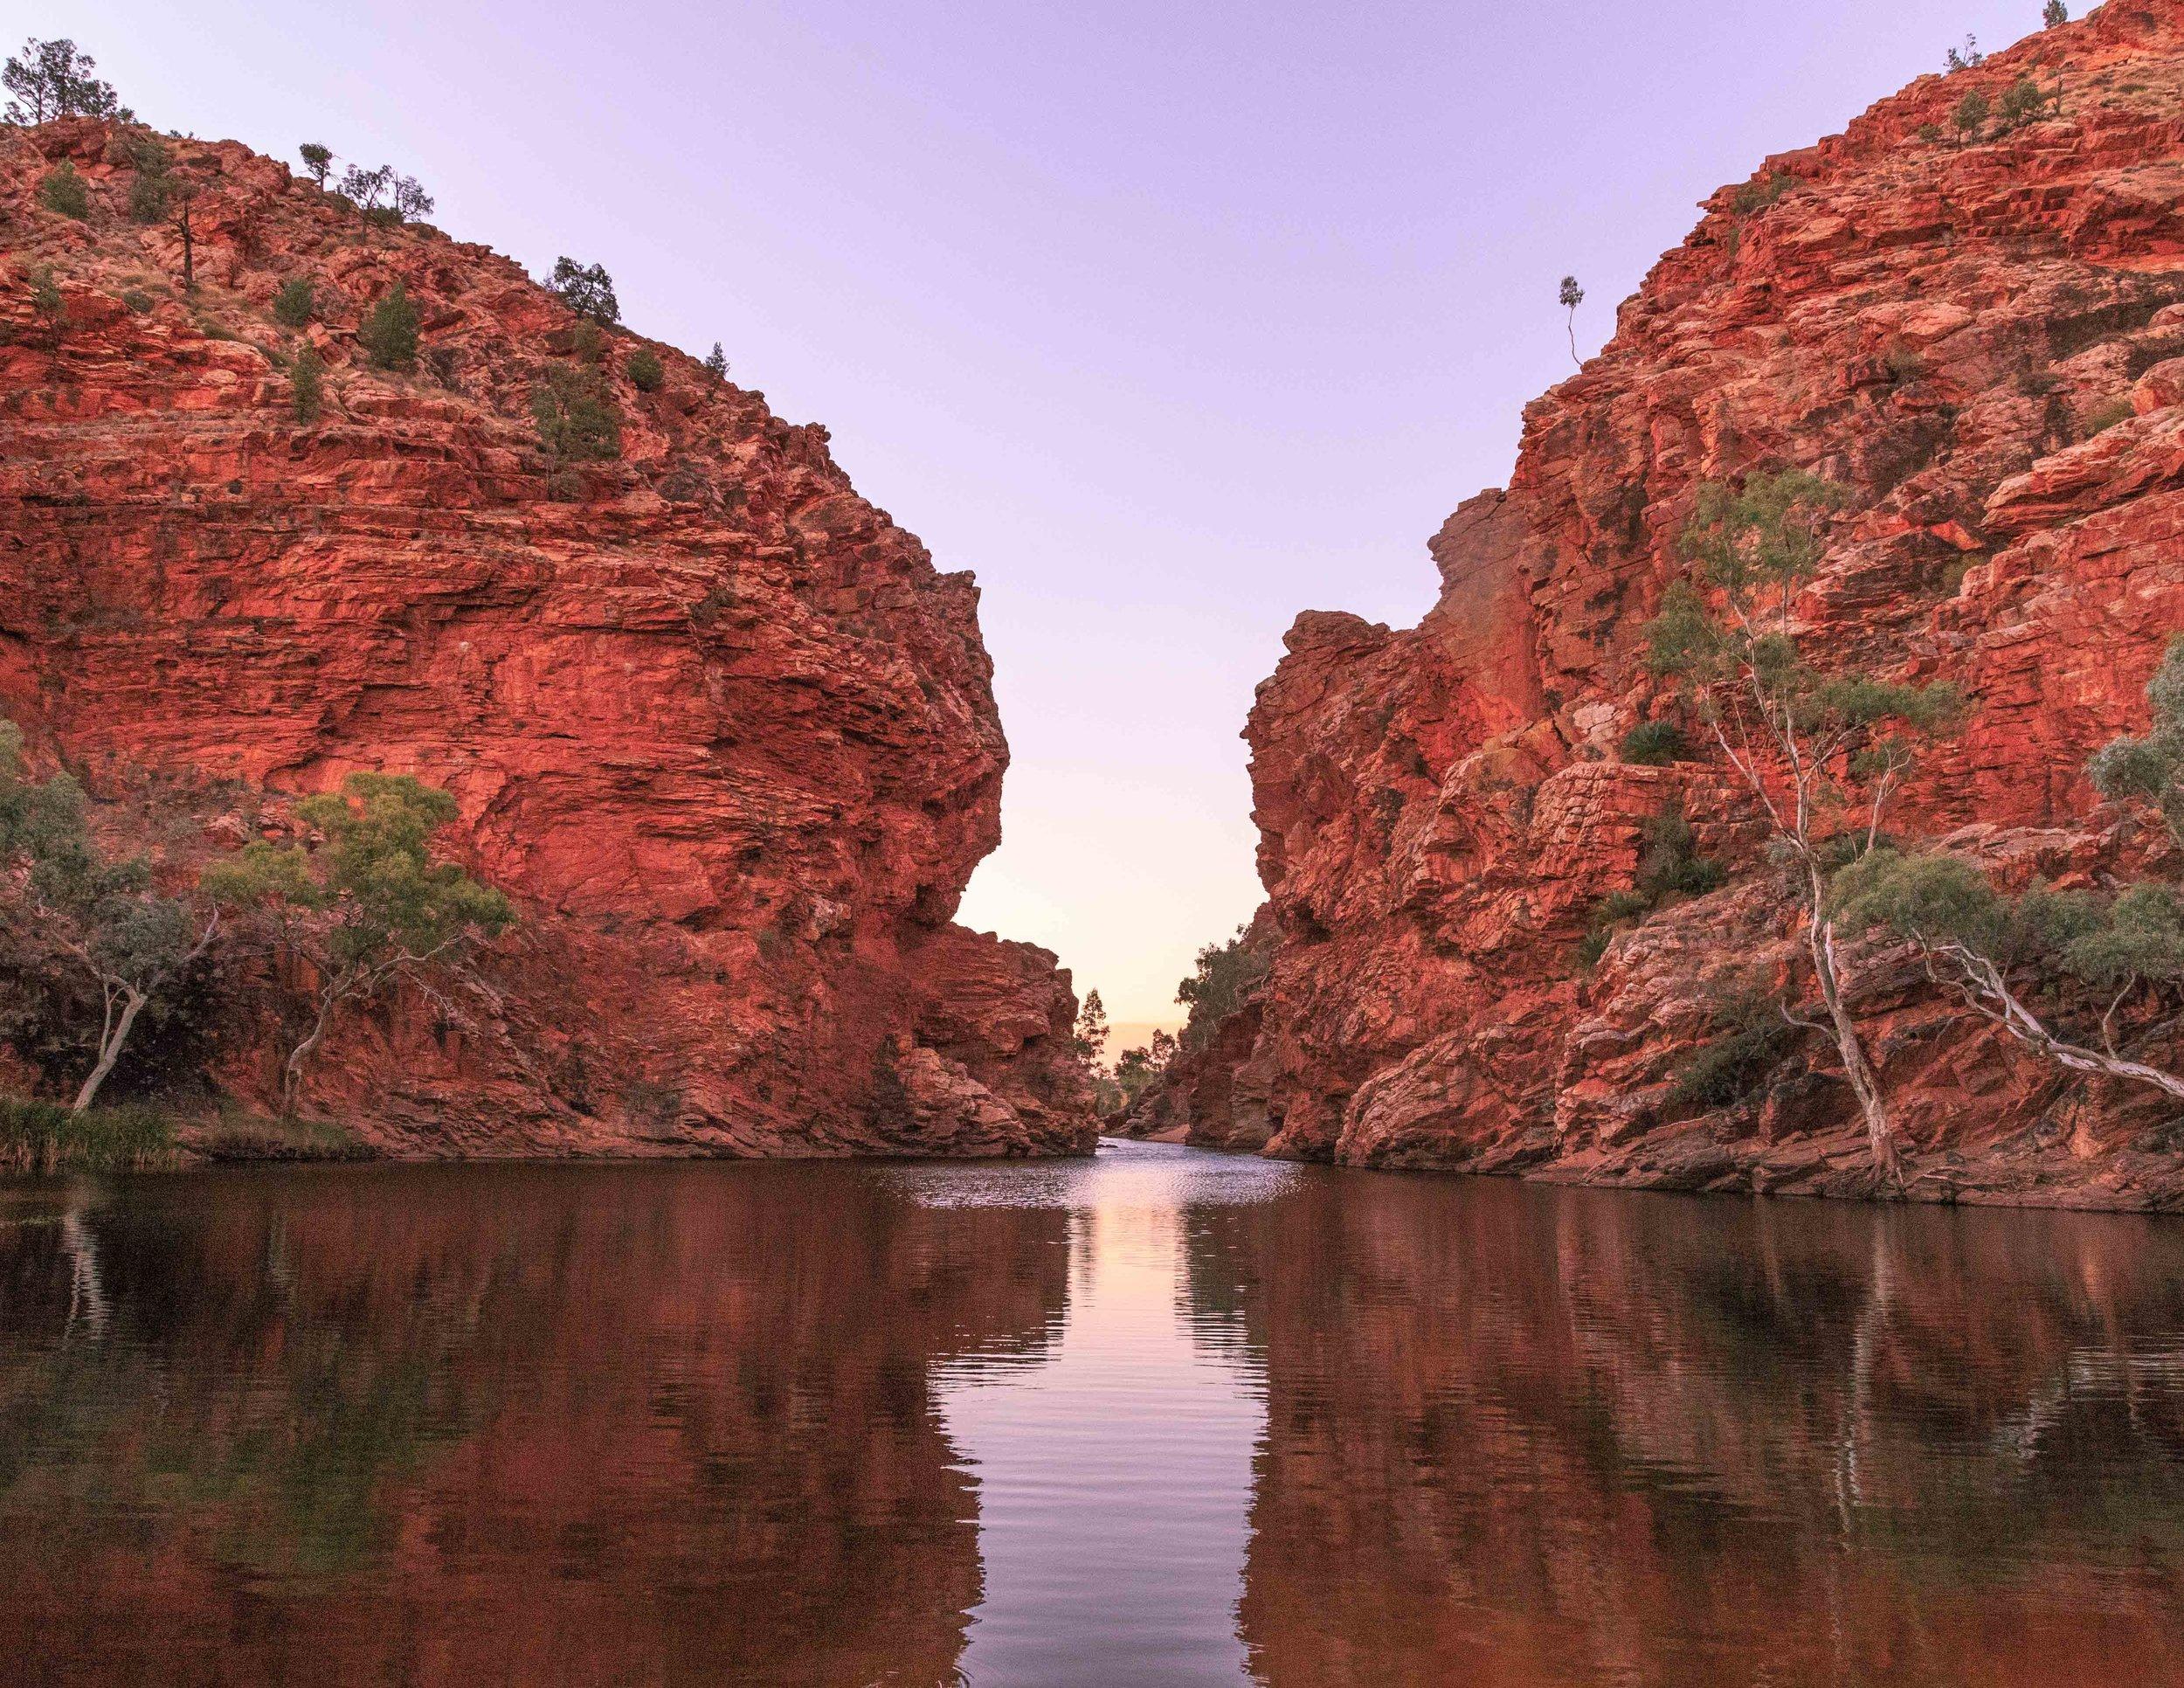 Instagrammable spots in the Outback: Ellery Big Creek